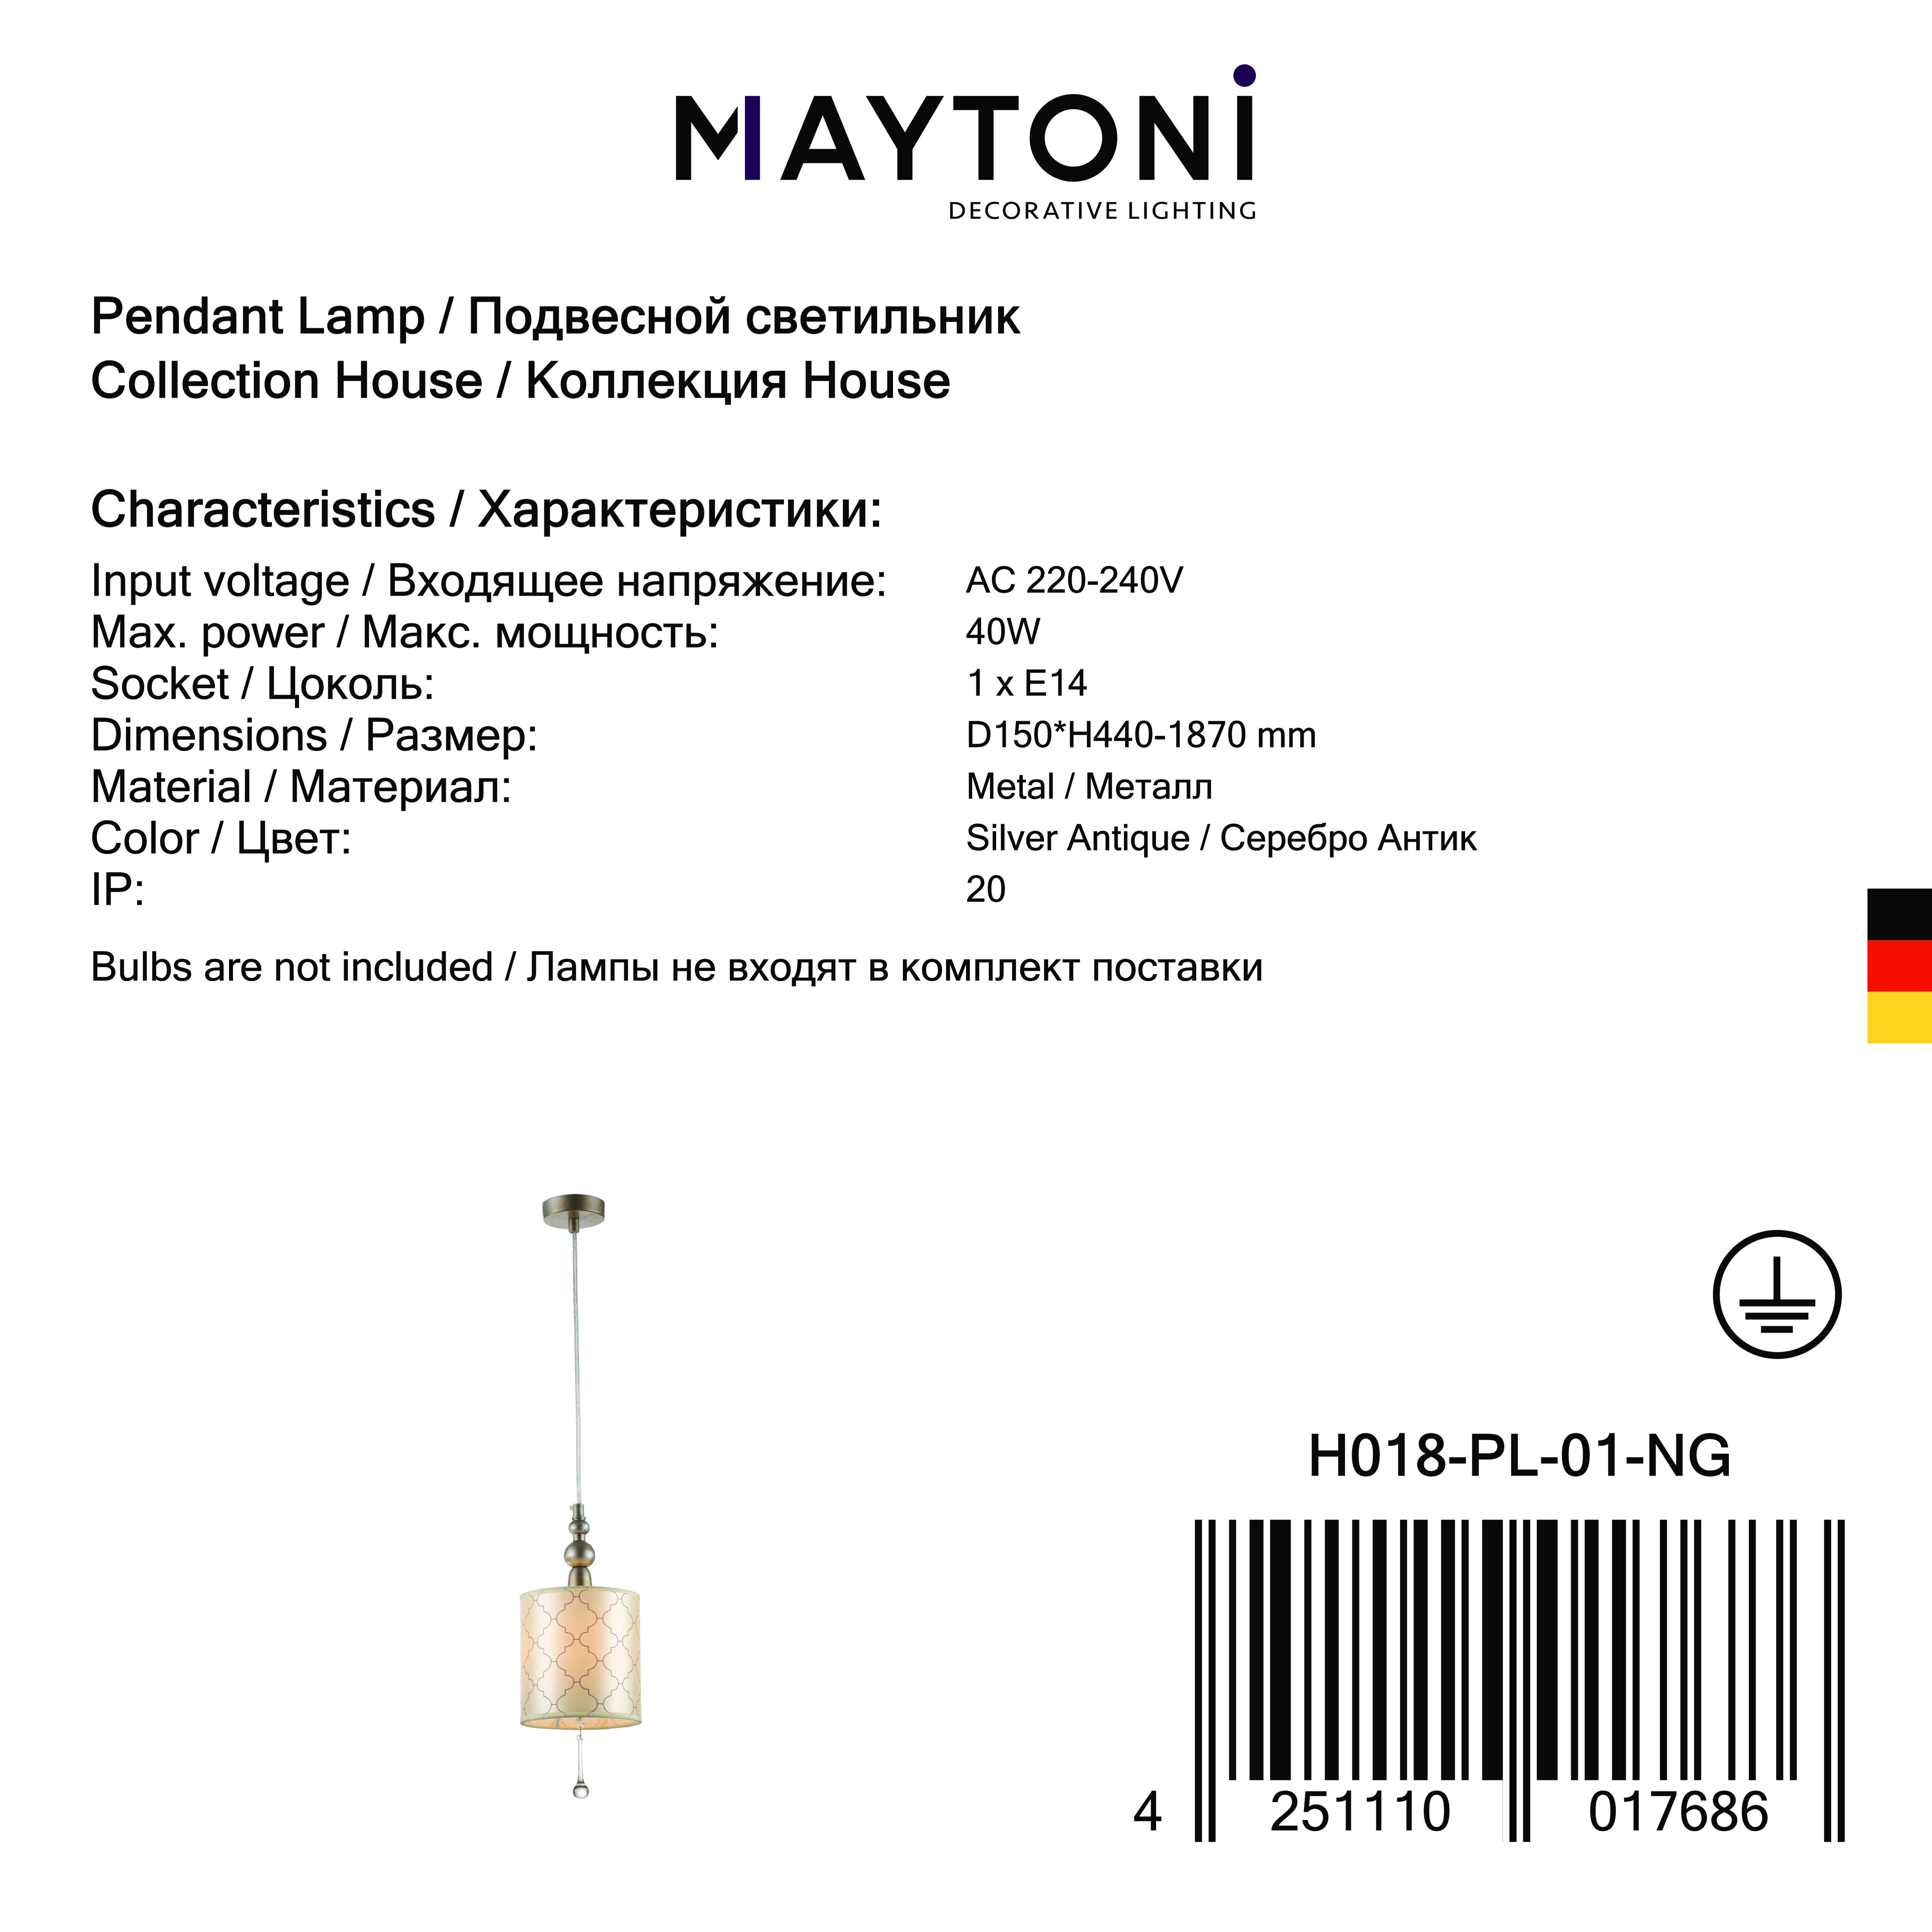 Подвесной светильник Maytoni Bience H018-PL-01-NG (dia018-22-ng), 1xE14x40W, серебро, бежевый, прозрачный, металл, текстиль, хрусталь - фото 8